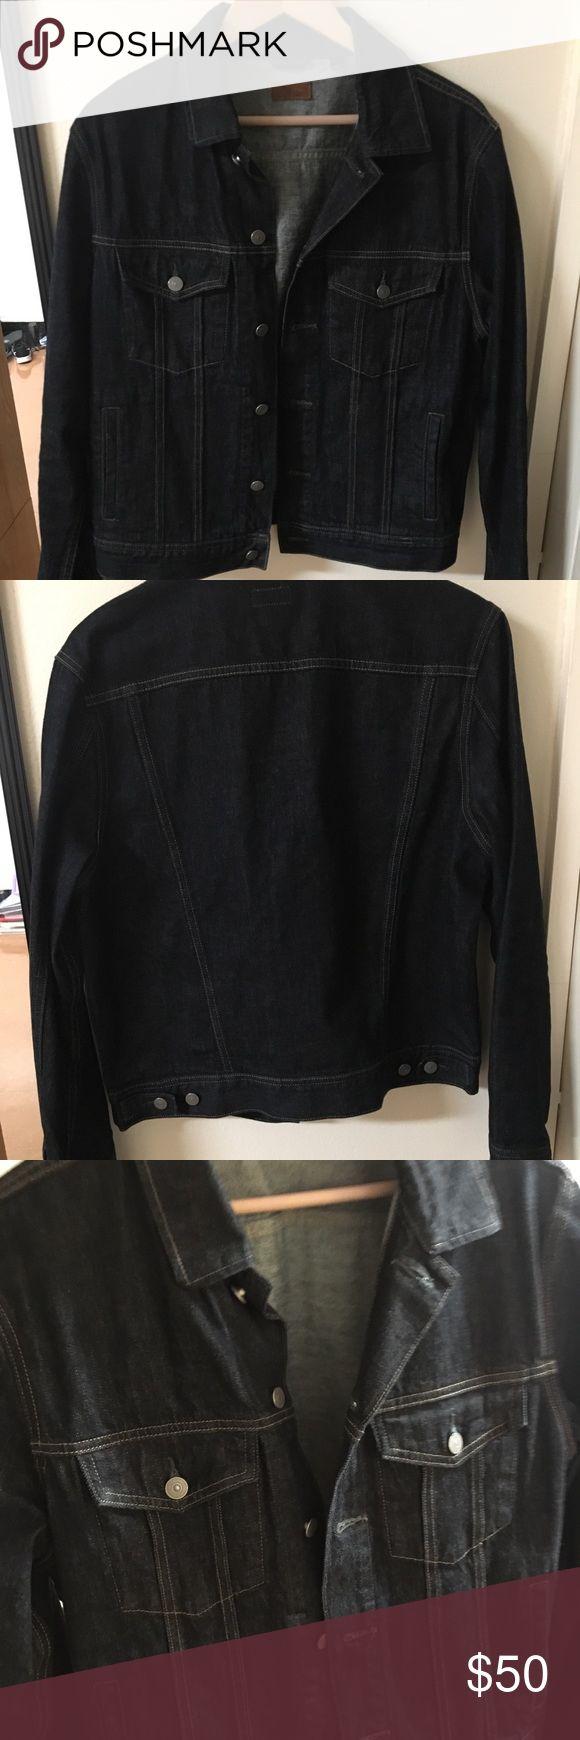 Mens Denim Jacket from J. Crew - Size Medium Never worn mens jean jacket from J Crew. Size Medium. J. Crew Jackets & Coats